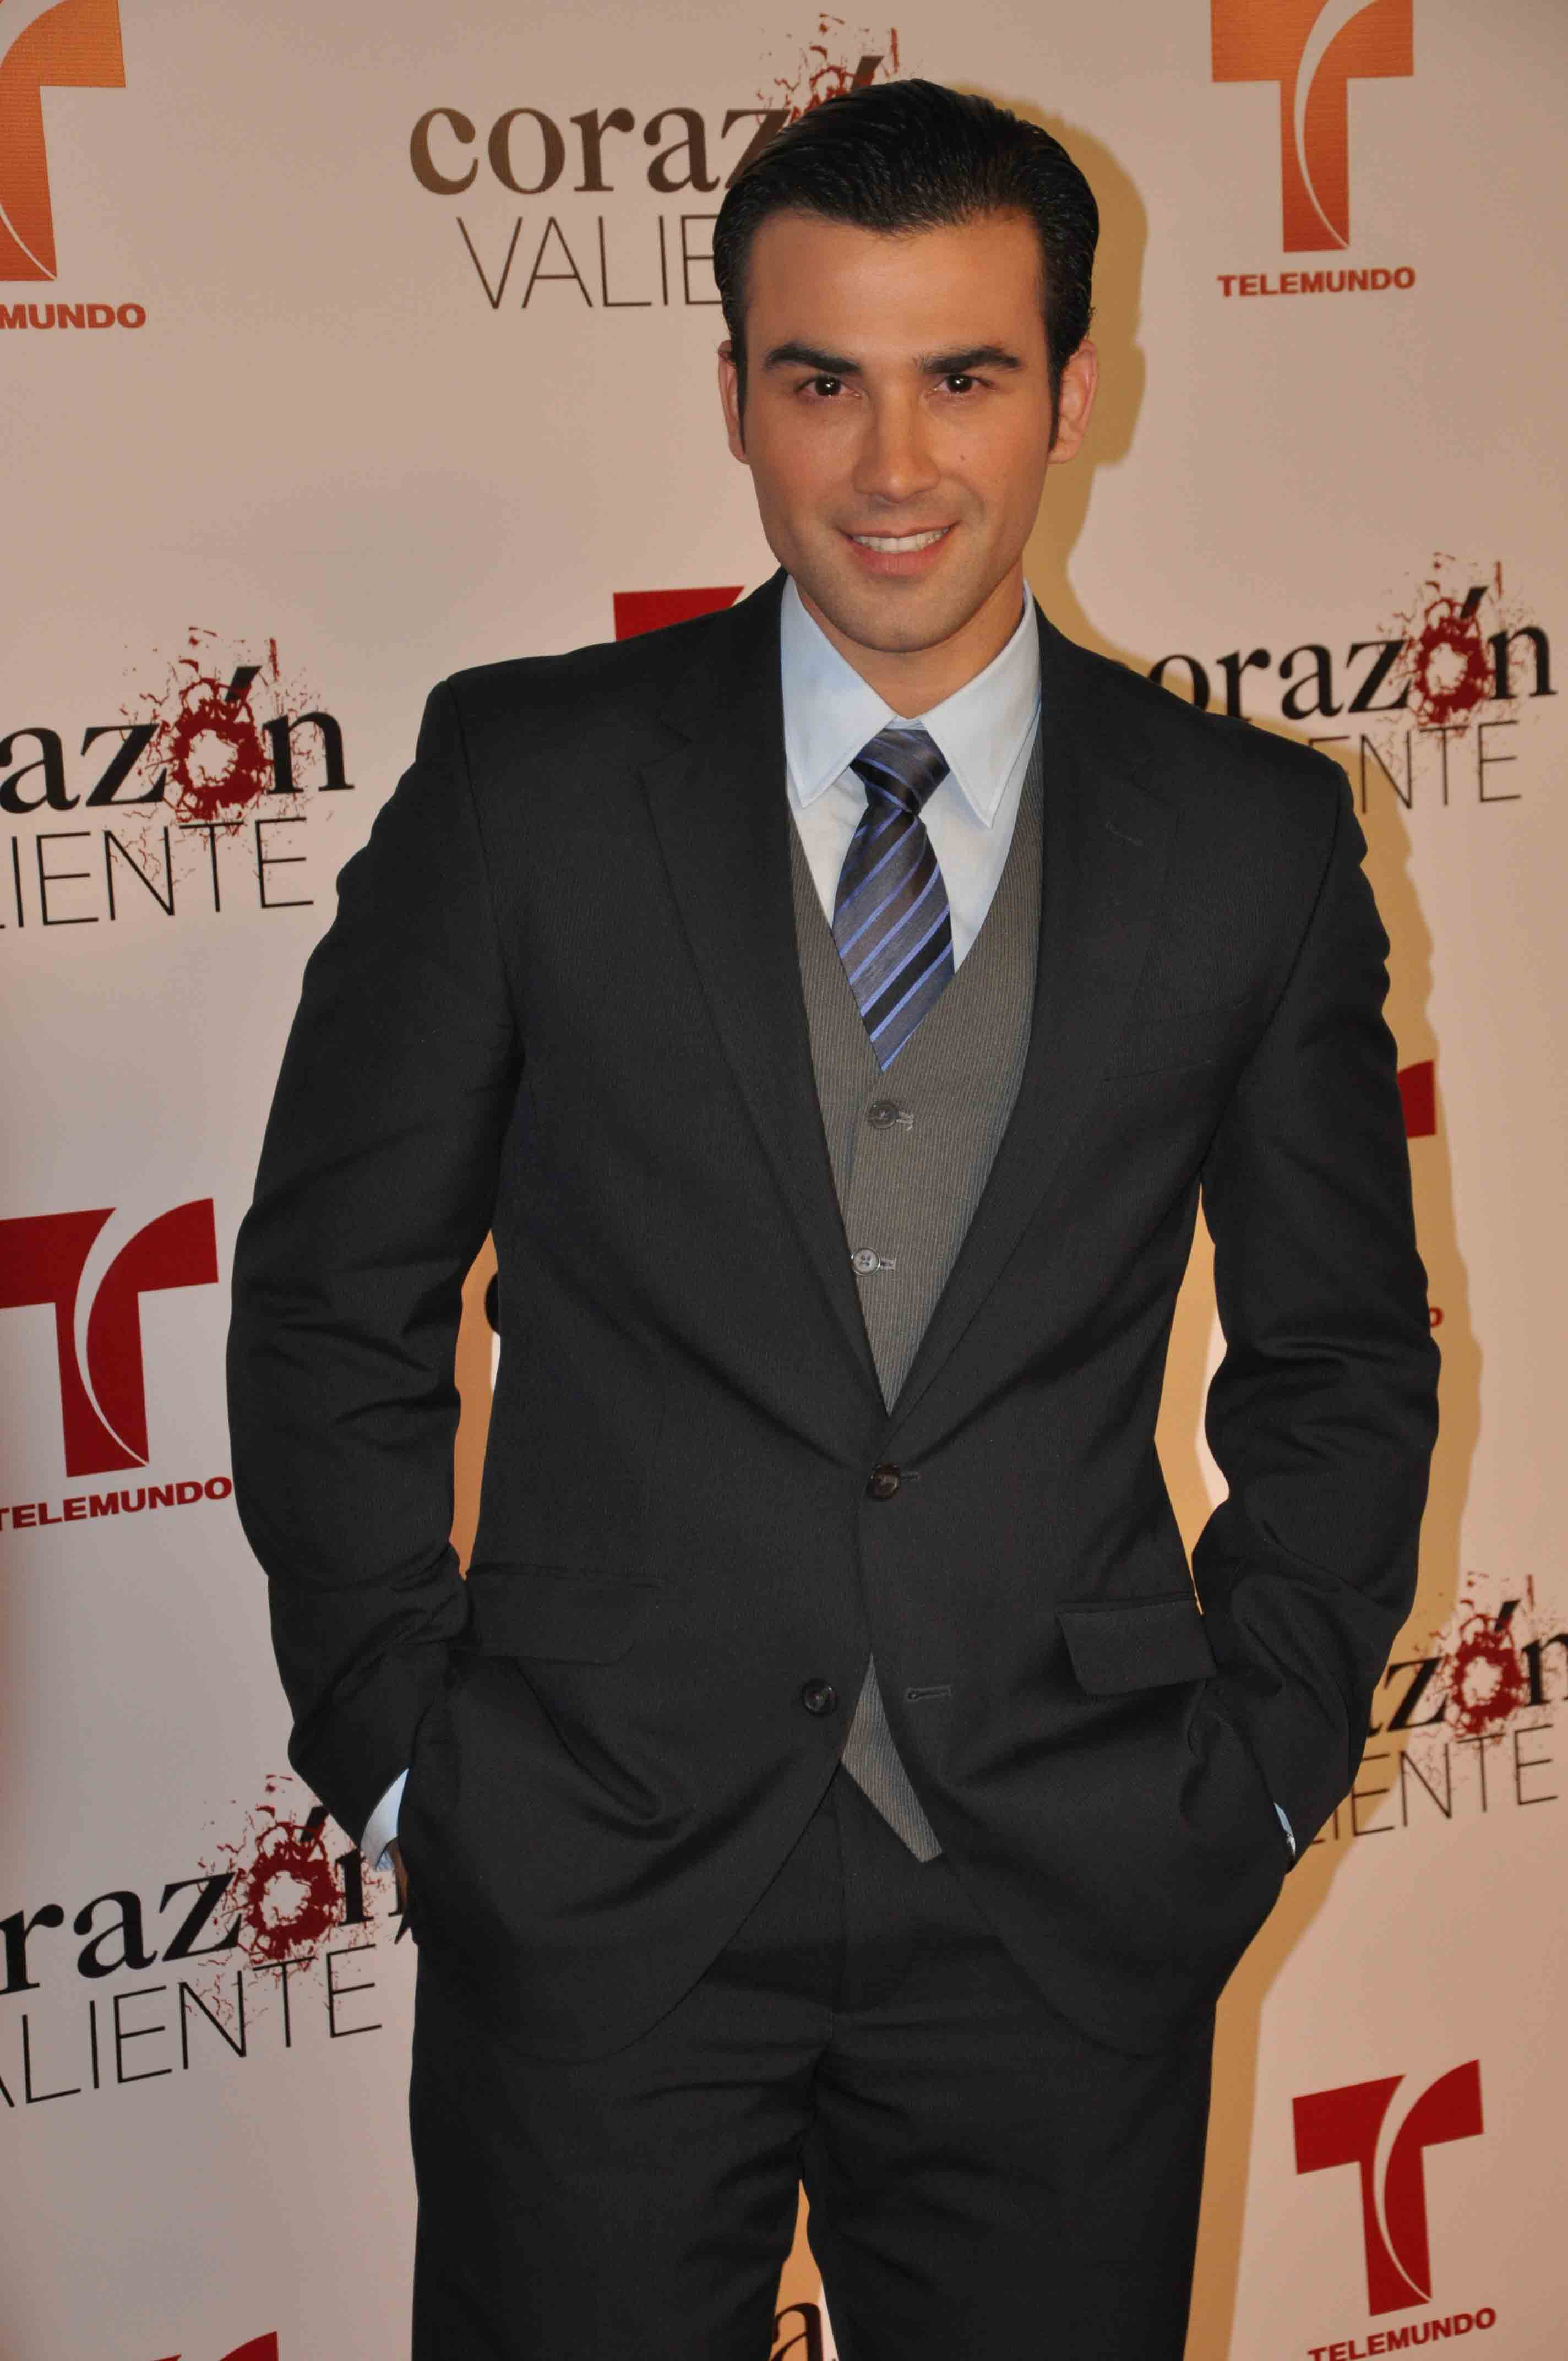 Jose Luis Resendez/ხოსე ლუის რესენდესი 4eae33dde885ce959d1a31b60973bd66